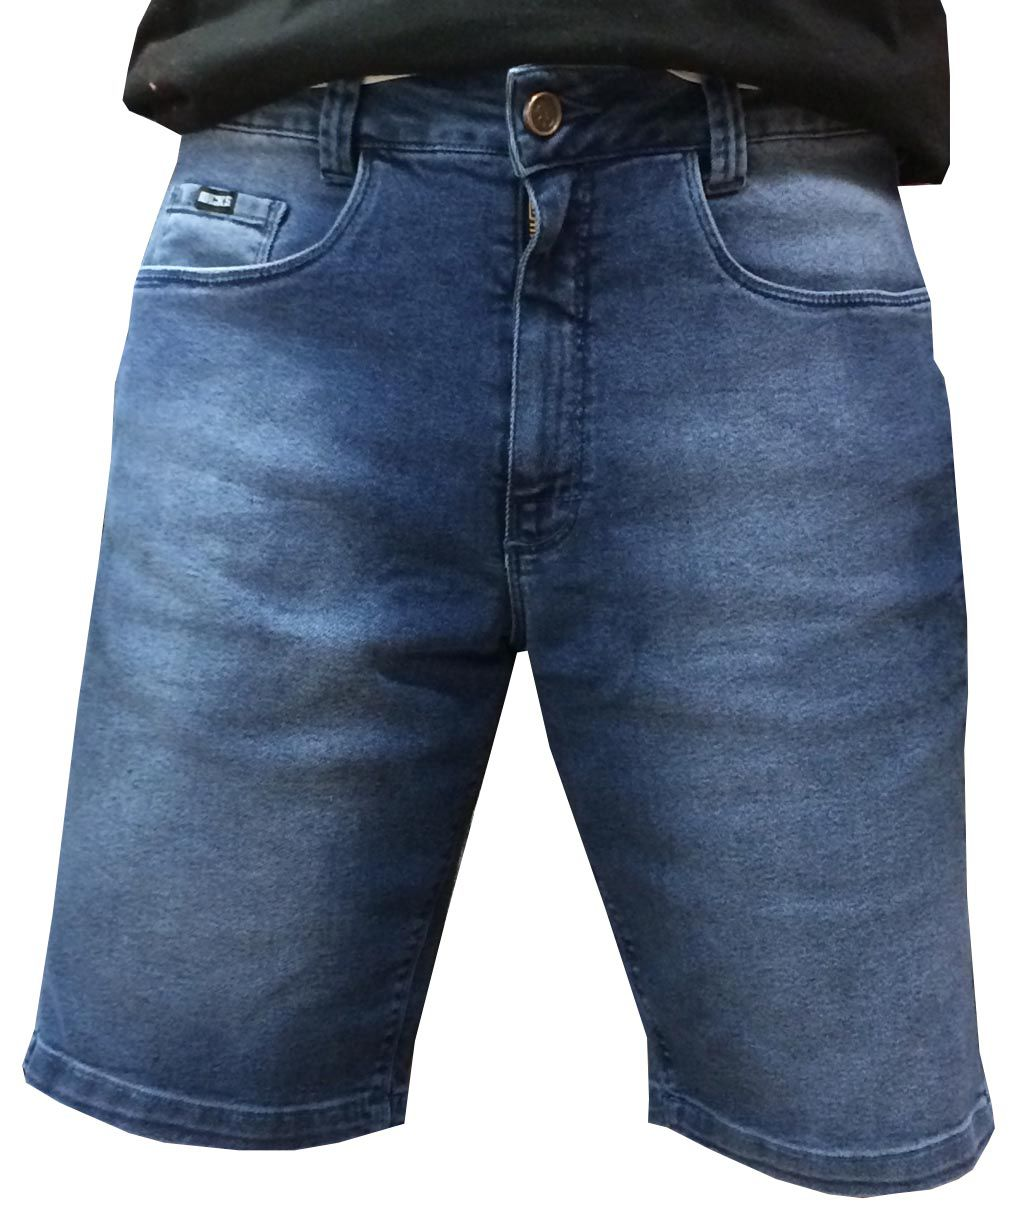 Bermuda Jeans Hocks 20-205 Masculina